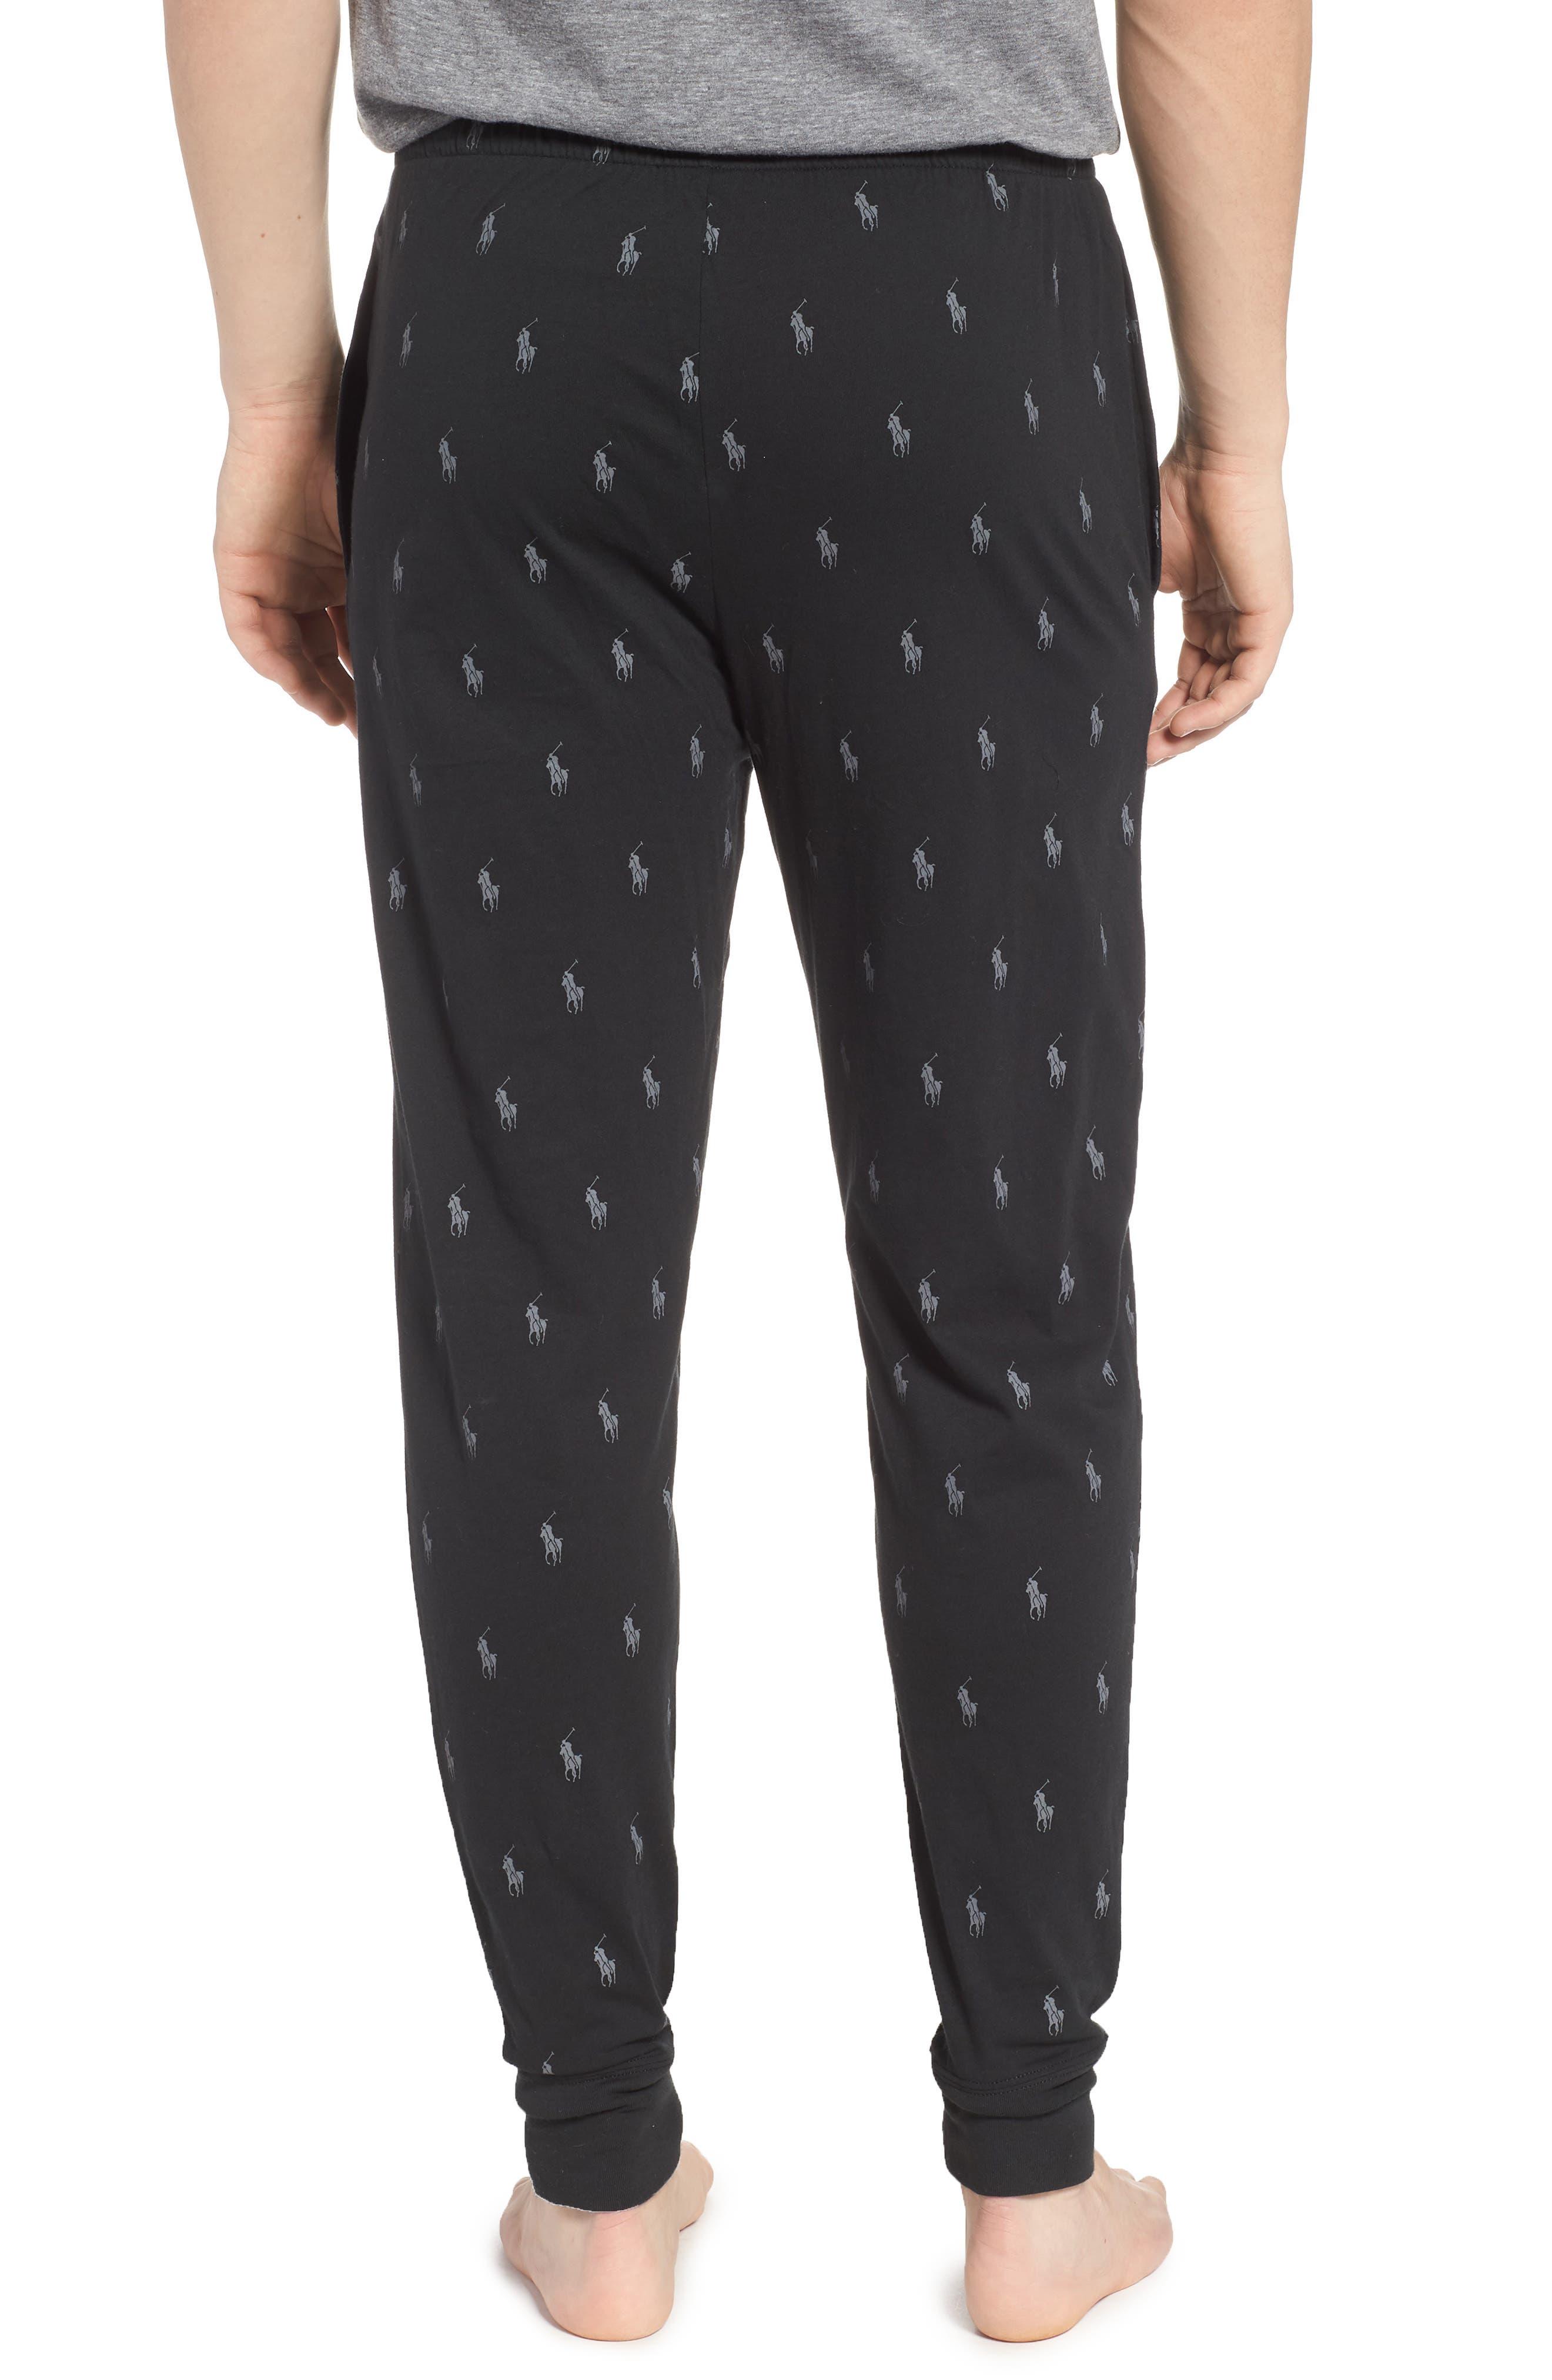 POLO RALPH LAUREN, Pony Print Pajama Pants, Alternate thumbnail 2, color, POLO BLACK